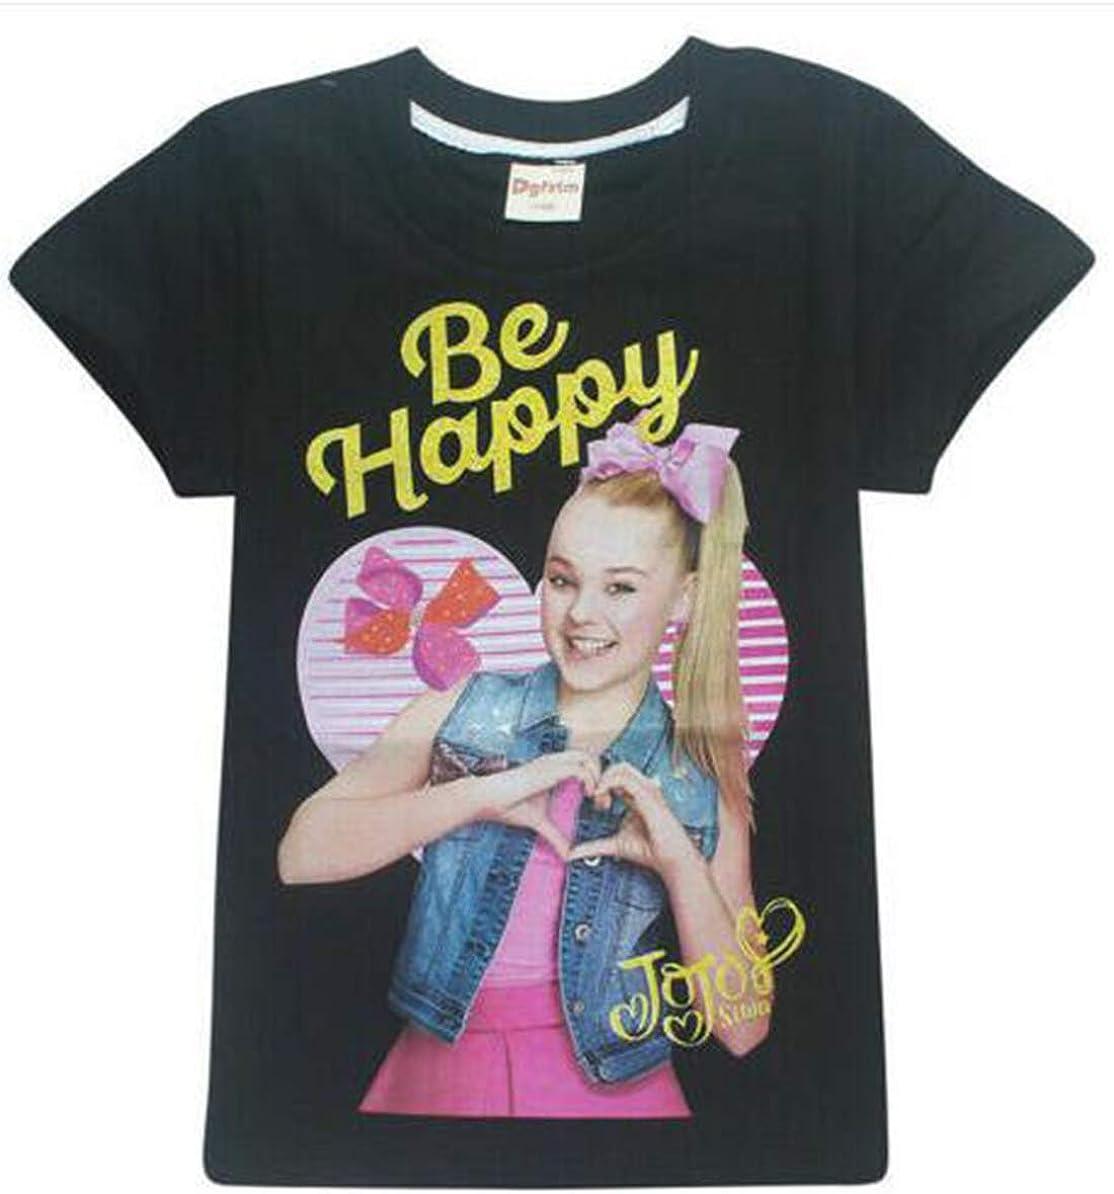 Kidskingdom Belpashe Jojo Siwa Printed Kids Girls T Shirt Summer Cotton Tops for Age 3-12Y